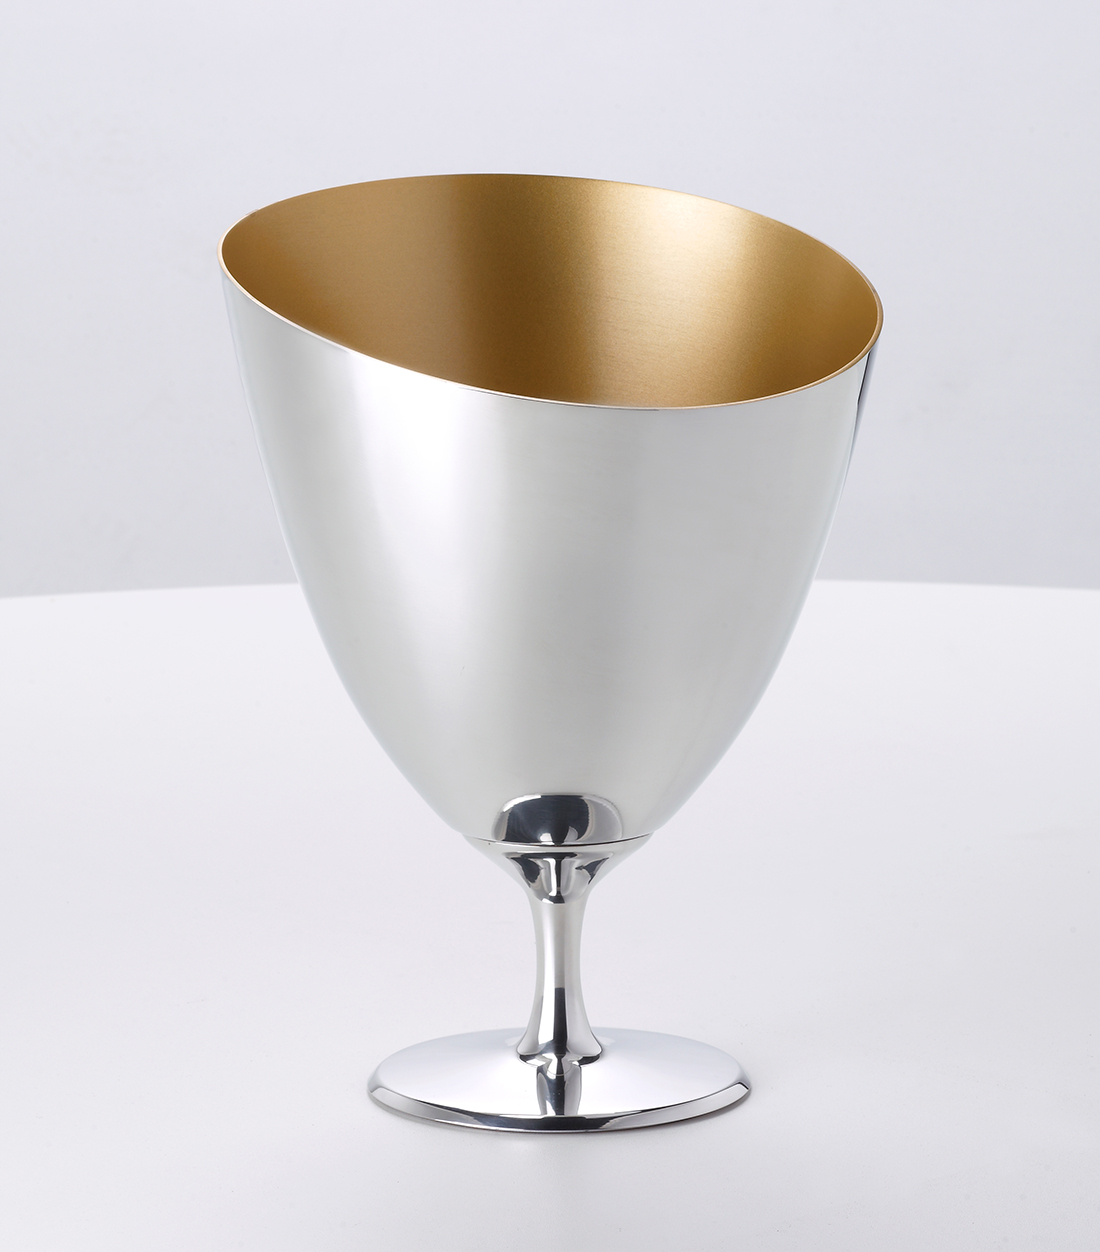 OA1710-seau-à-champagne-design-produit-agence-planet-design-eric-berthes05.jpg